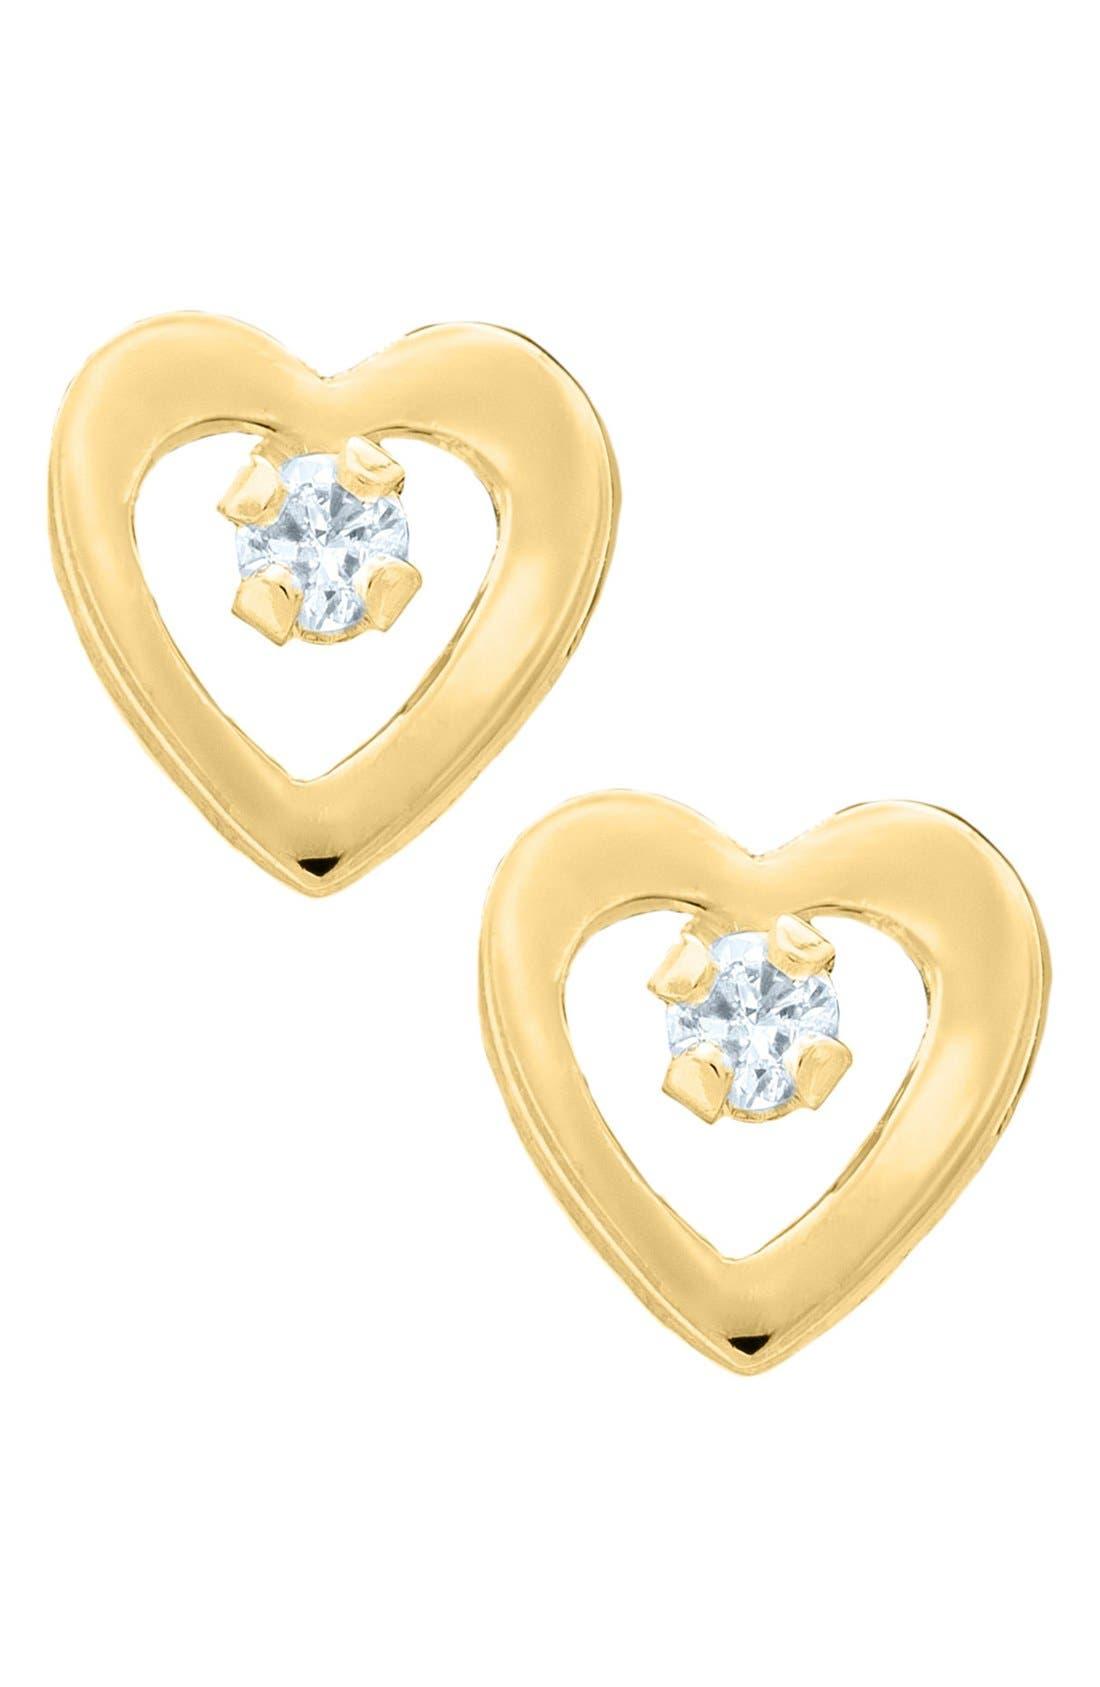 14k Yellow Gold & Diamond Open Heart Earrings,                         Main,                         color, GOLD